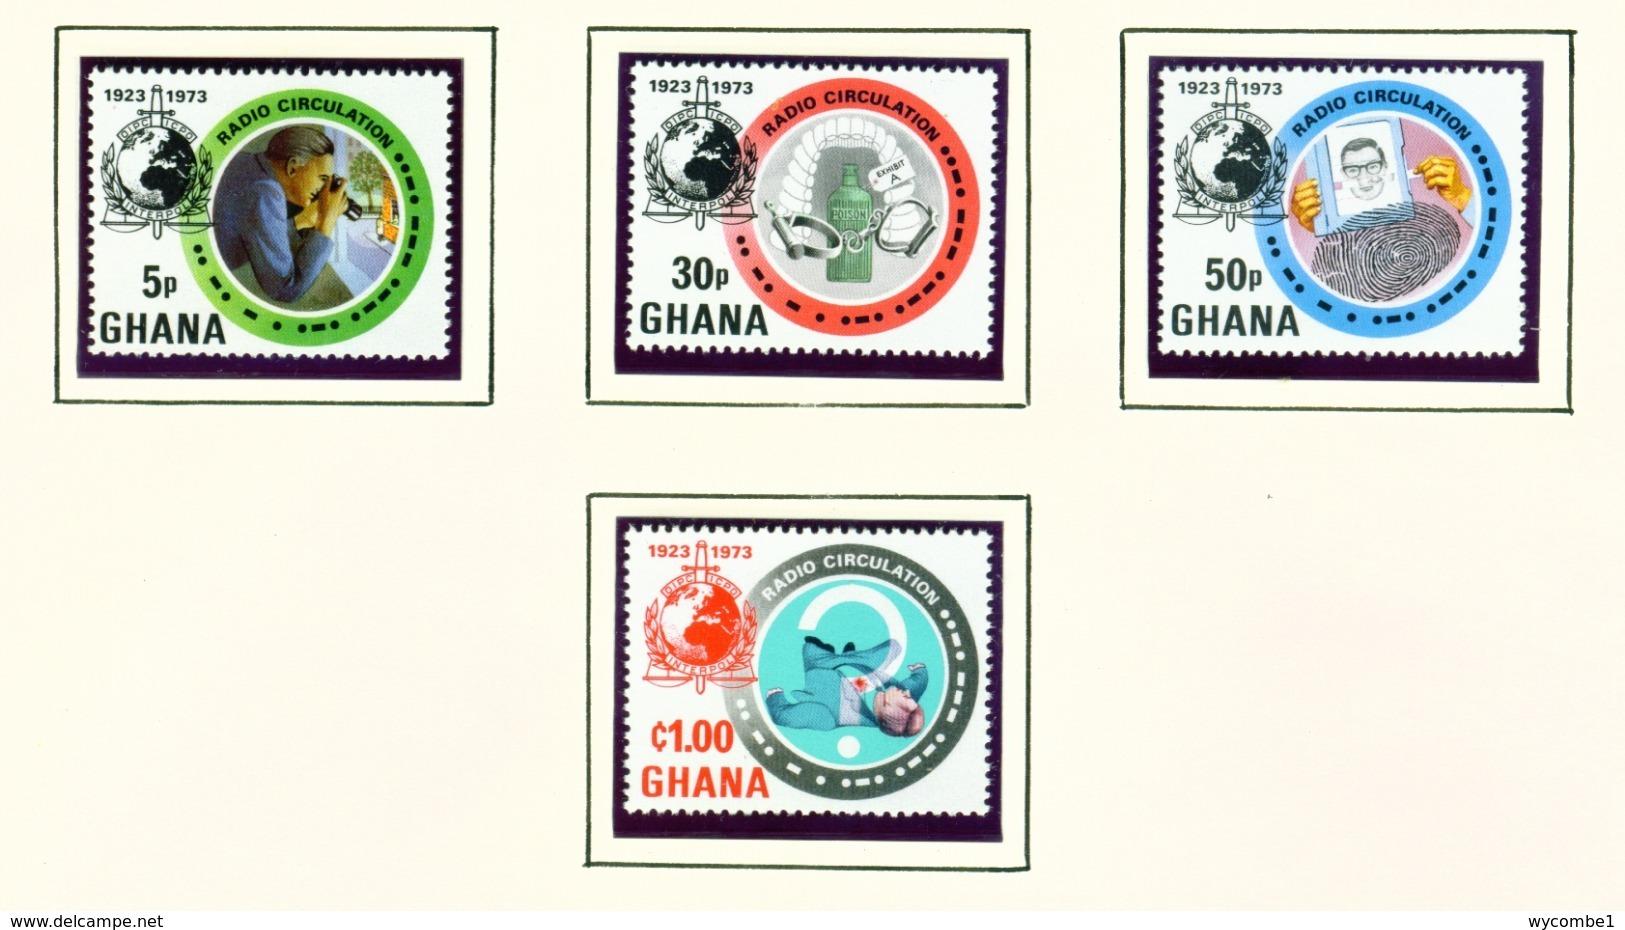 GHANA  -  1973 Interpol Set Unmounted/Never Hinged Mint - Ghana (1957-...)